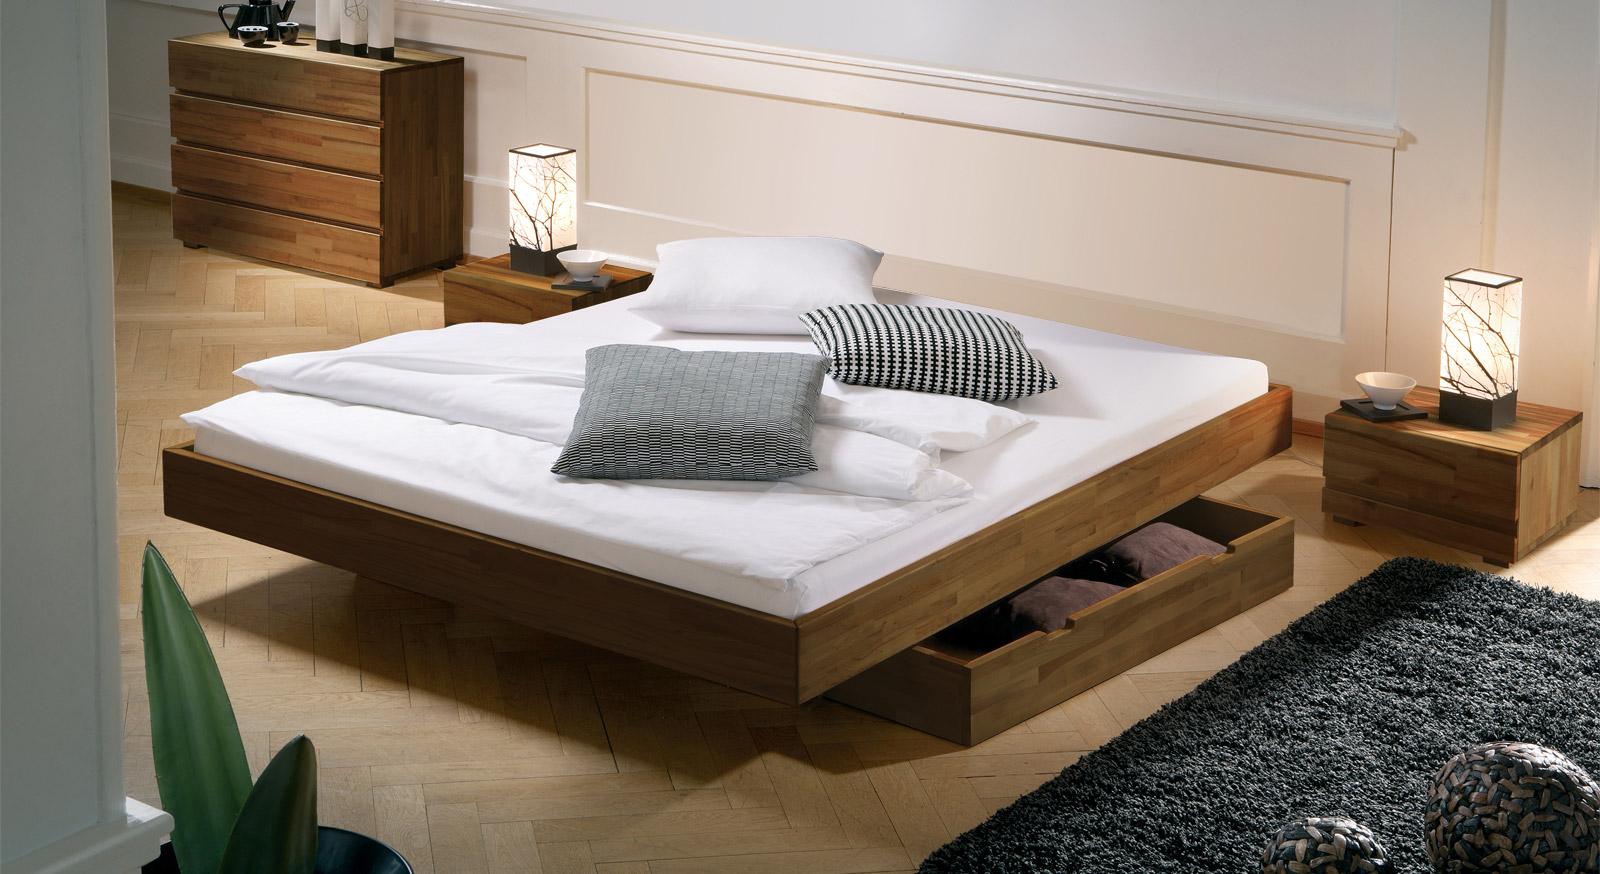 bett mit schweberahmen in nussbaumoptik liege rimini. Black Bedroom Furniture Sets. Home Design Ideas